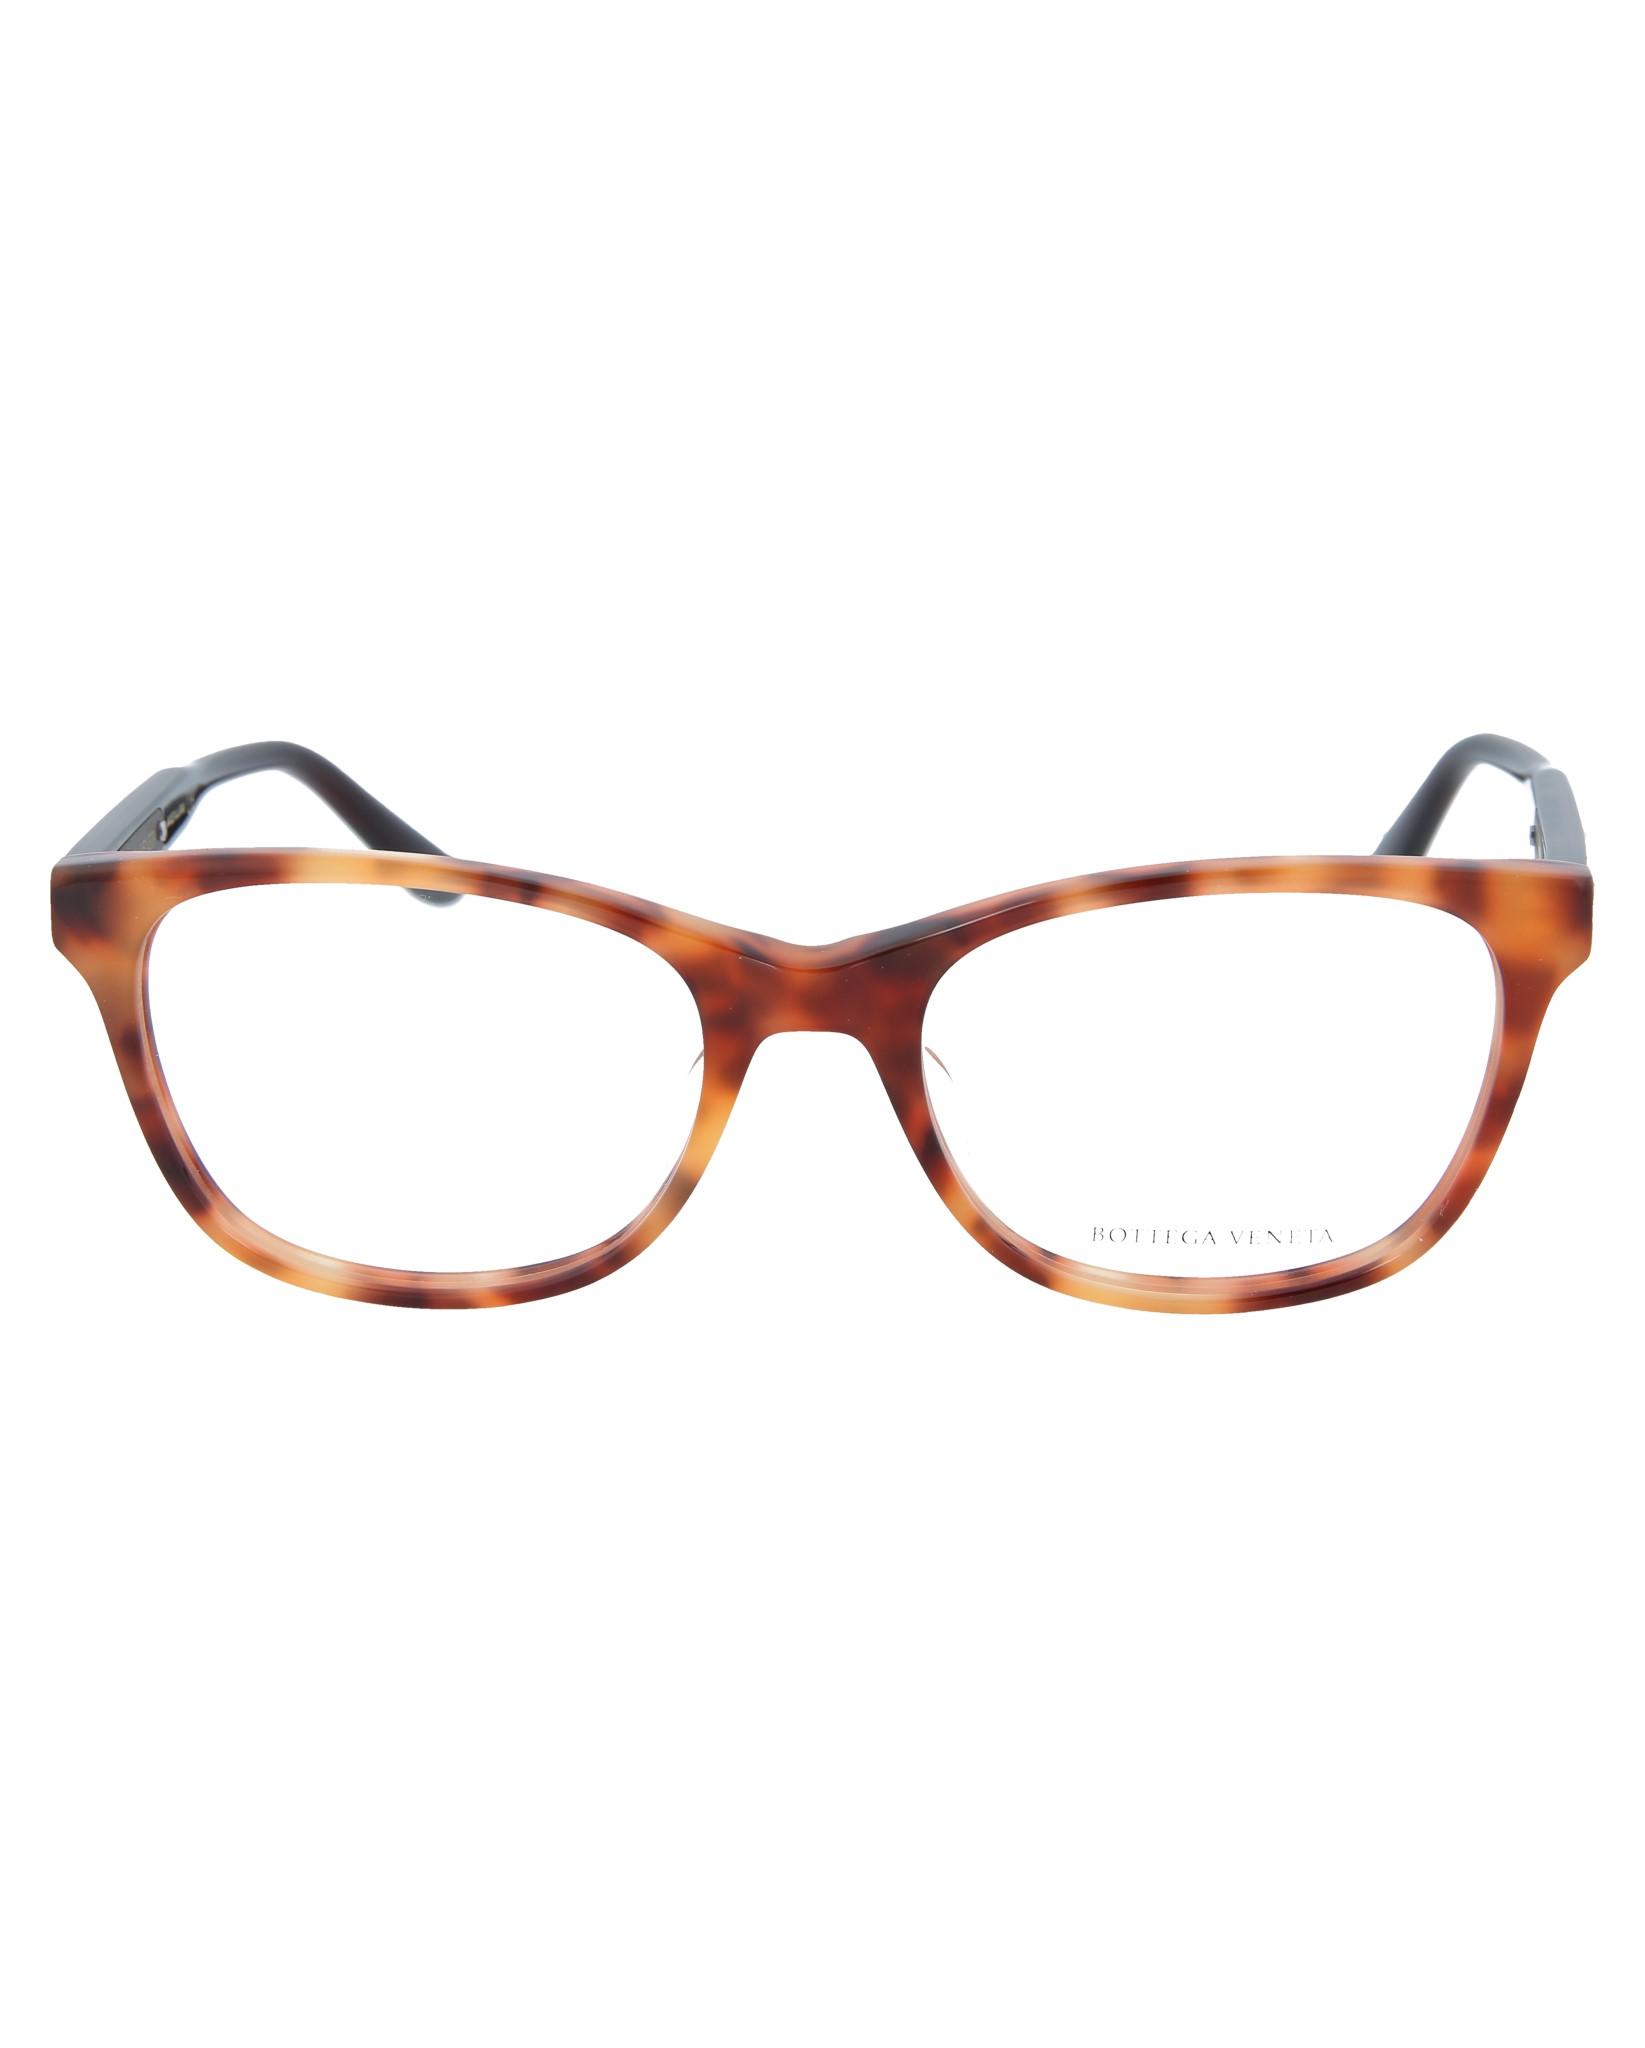 92b35292f94 BOTTEGA Veneta Womens Cat Eye Optical Frames Bv0024oa-30000270-004 ...